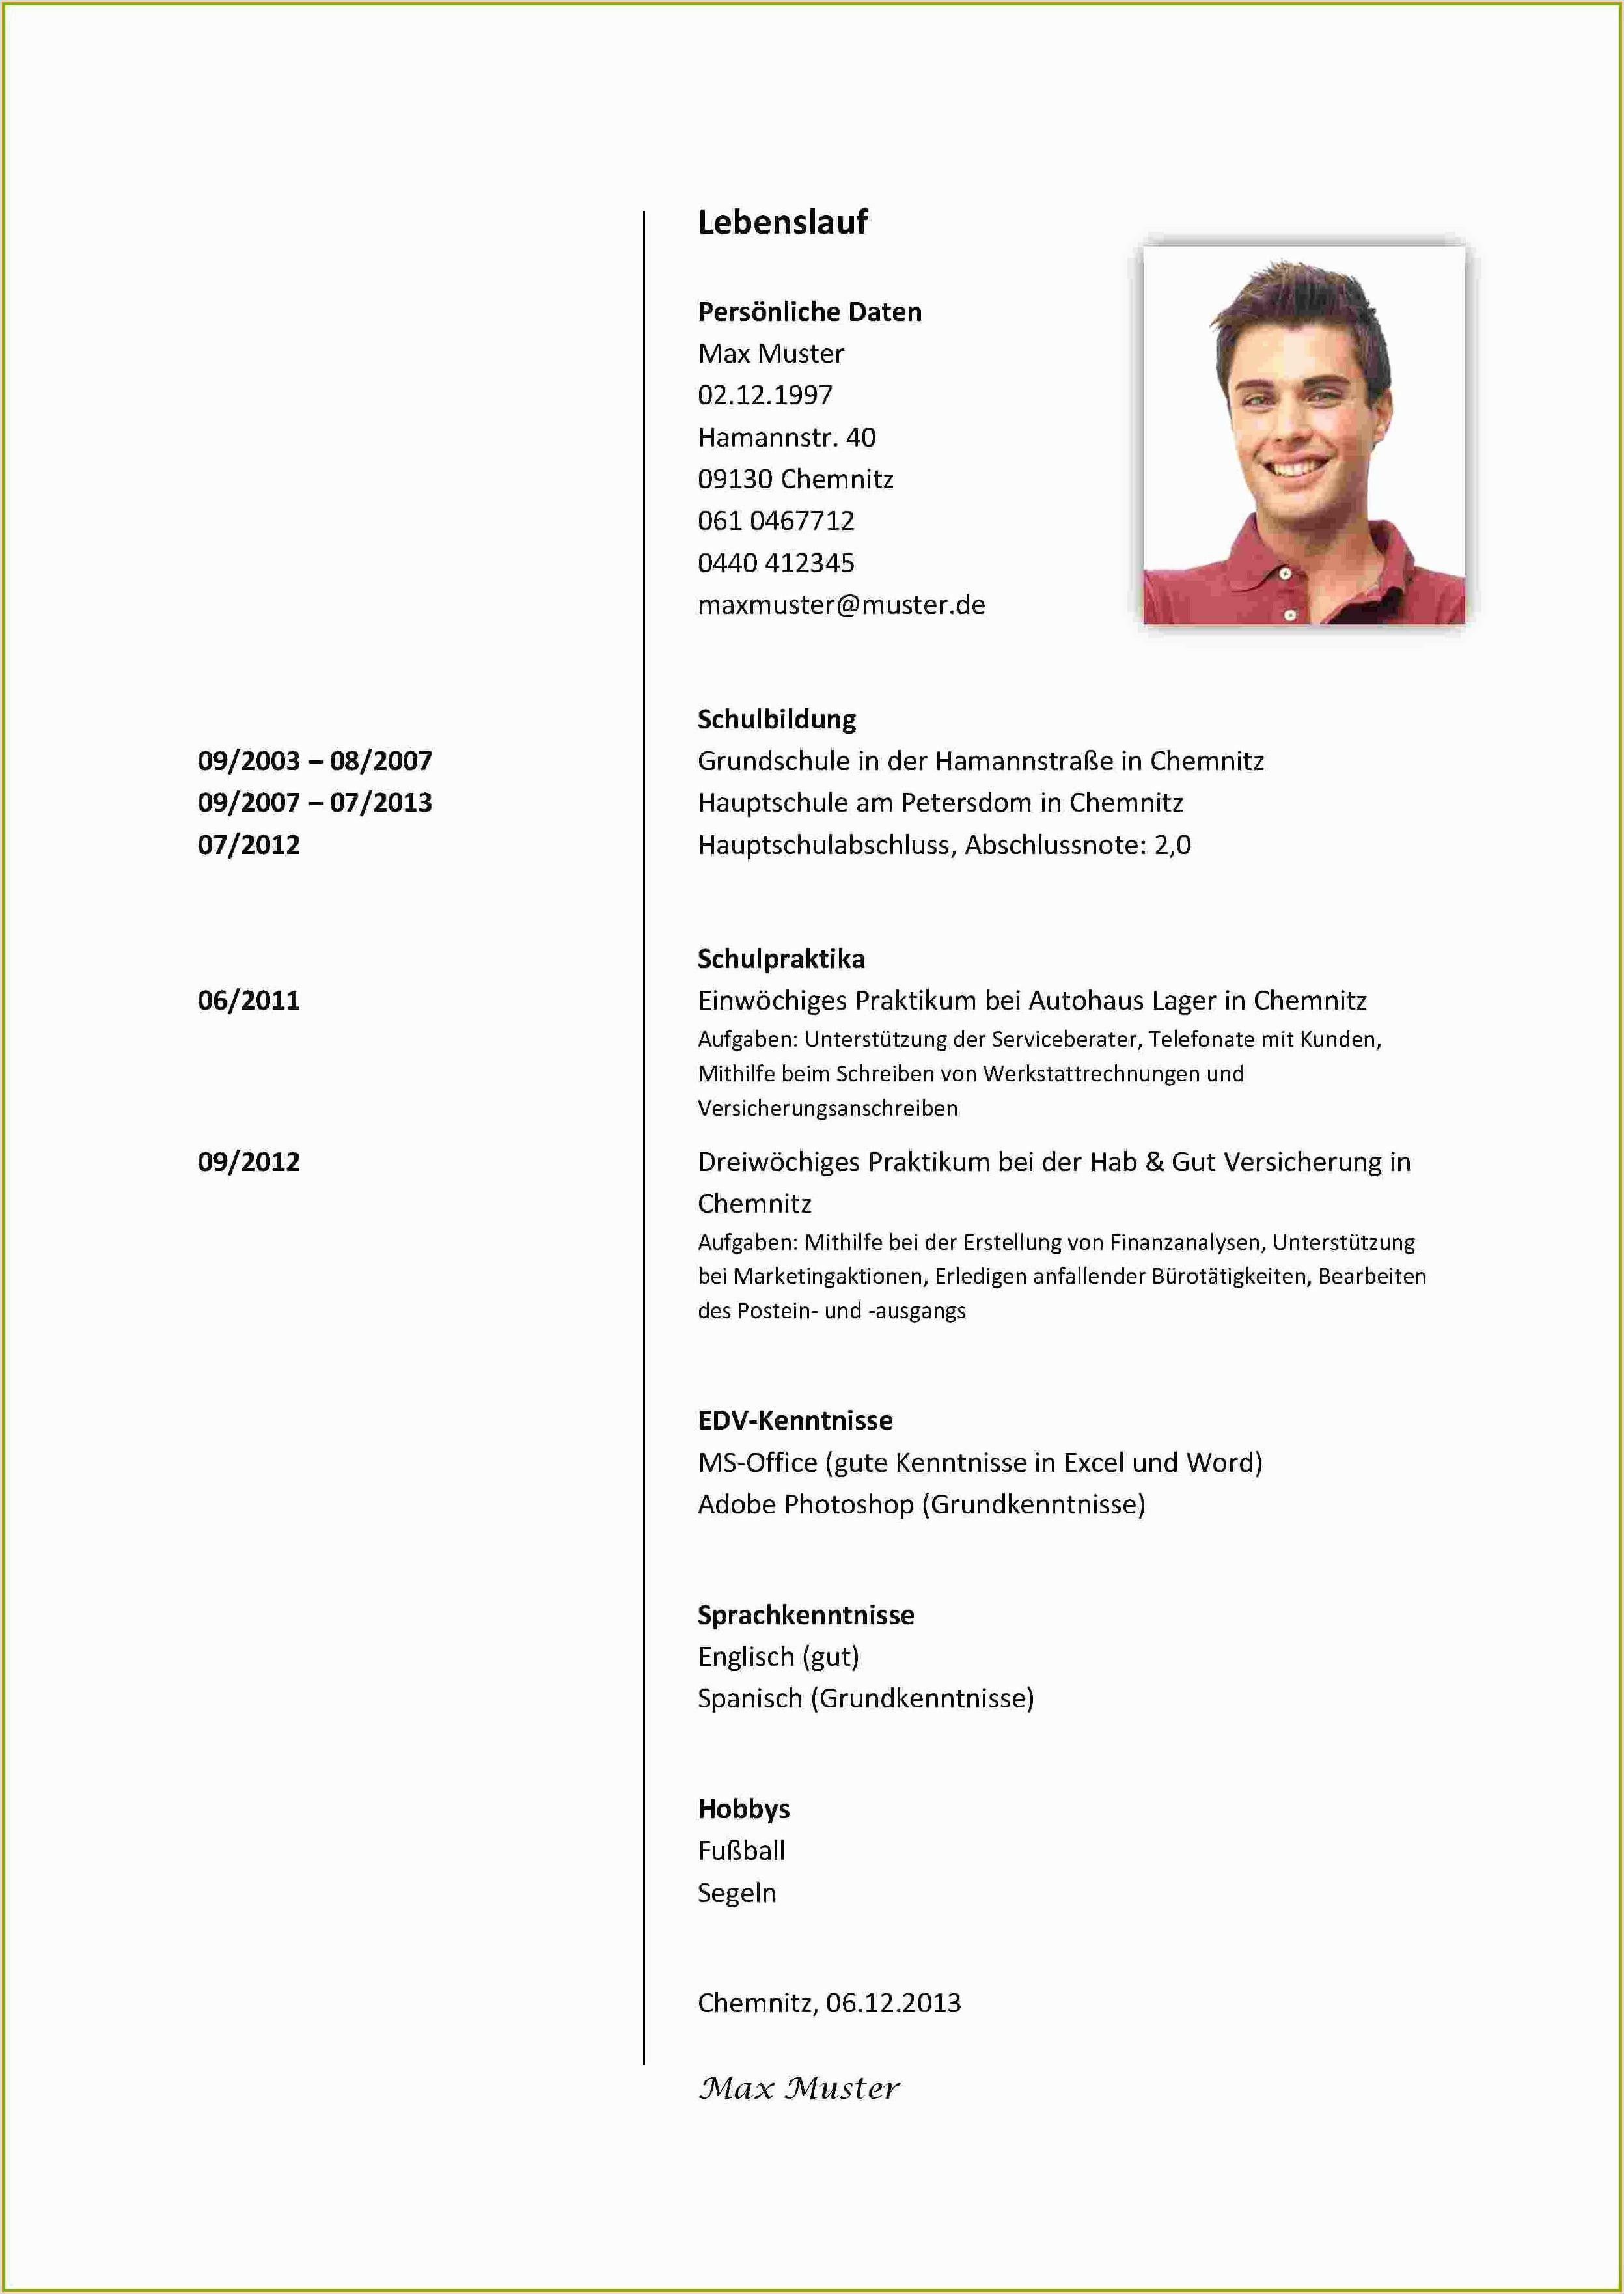 Lebenslauf Muster Fur Schulerpraktikum In 2020 Cv Examples Document Templates Resume Words